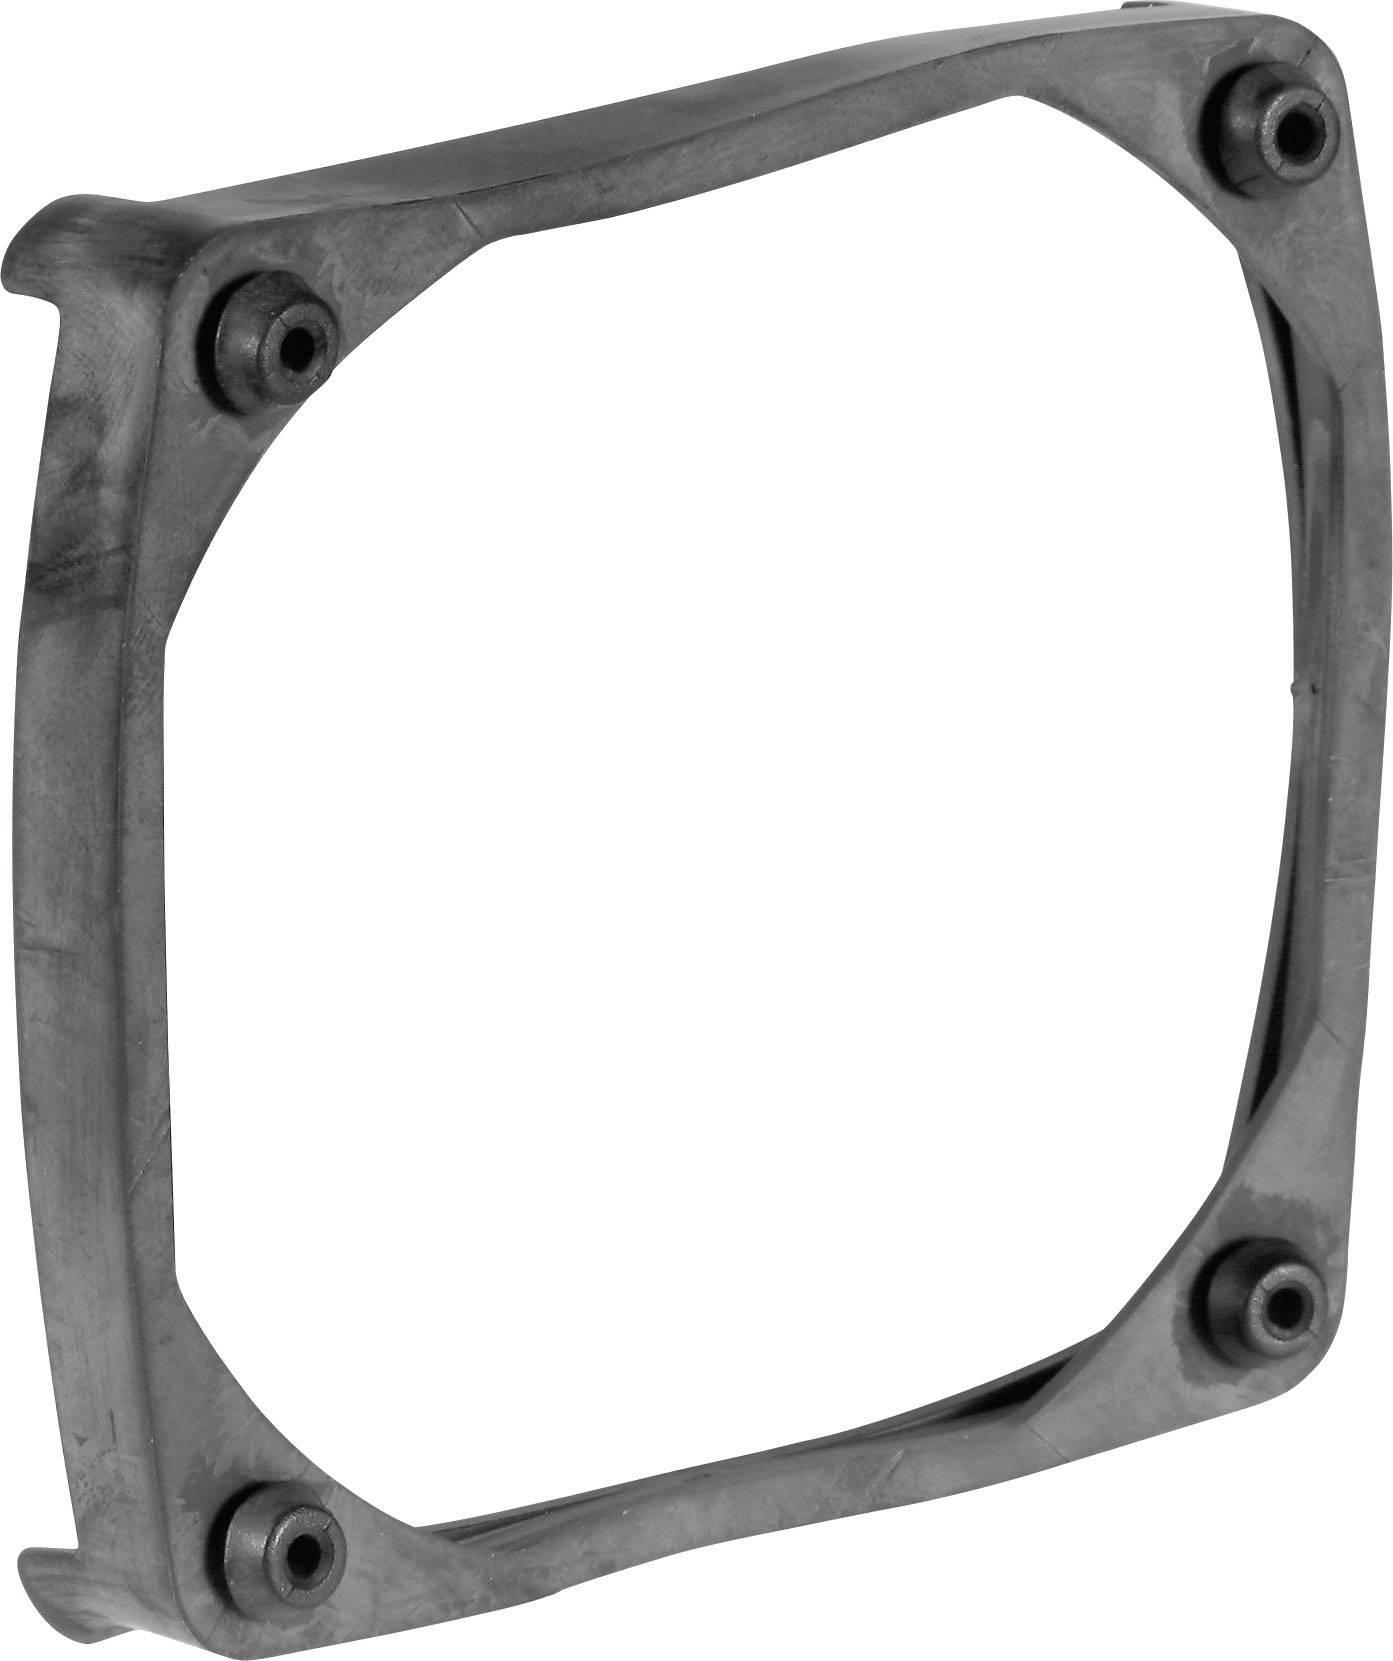 SEPA;954071020, (š x v x h) 43 x 43 x 13.25 mm, 1 ks, elastomér